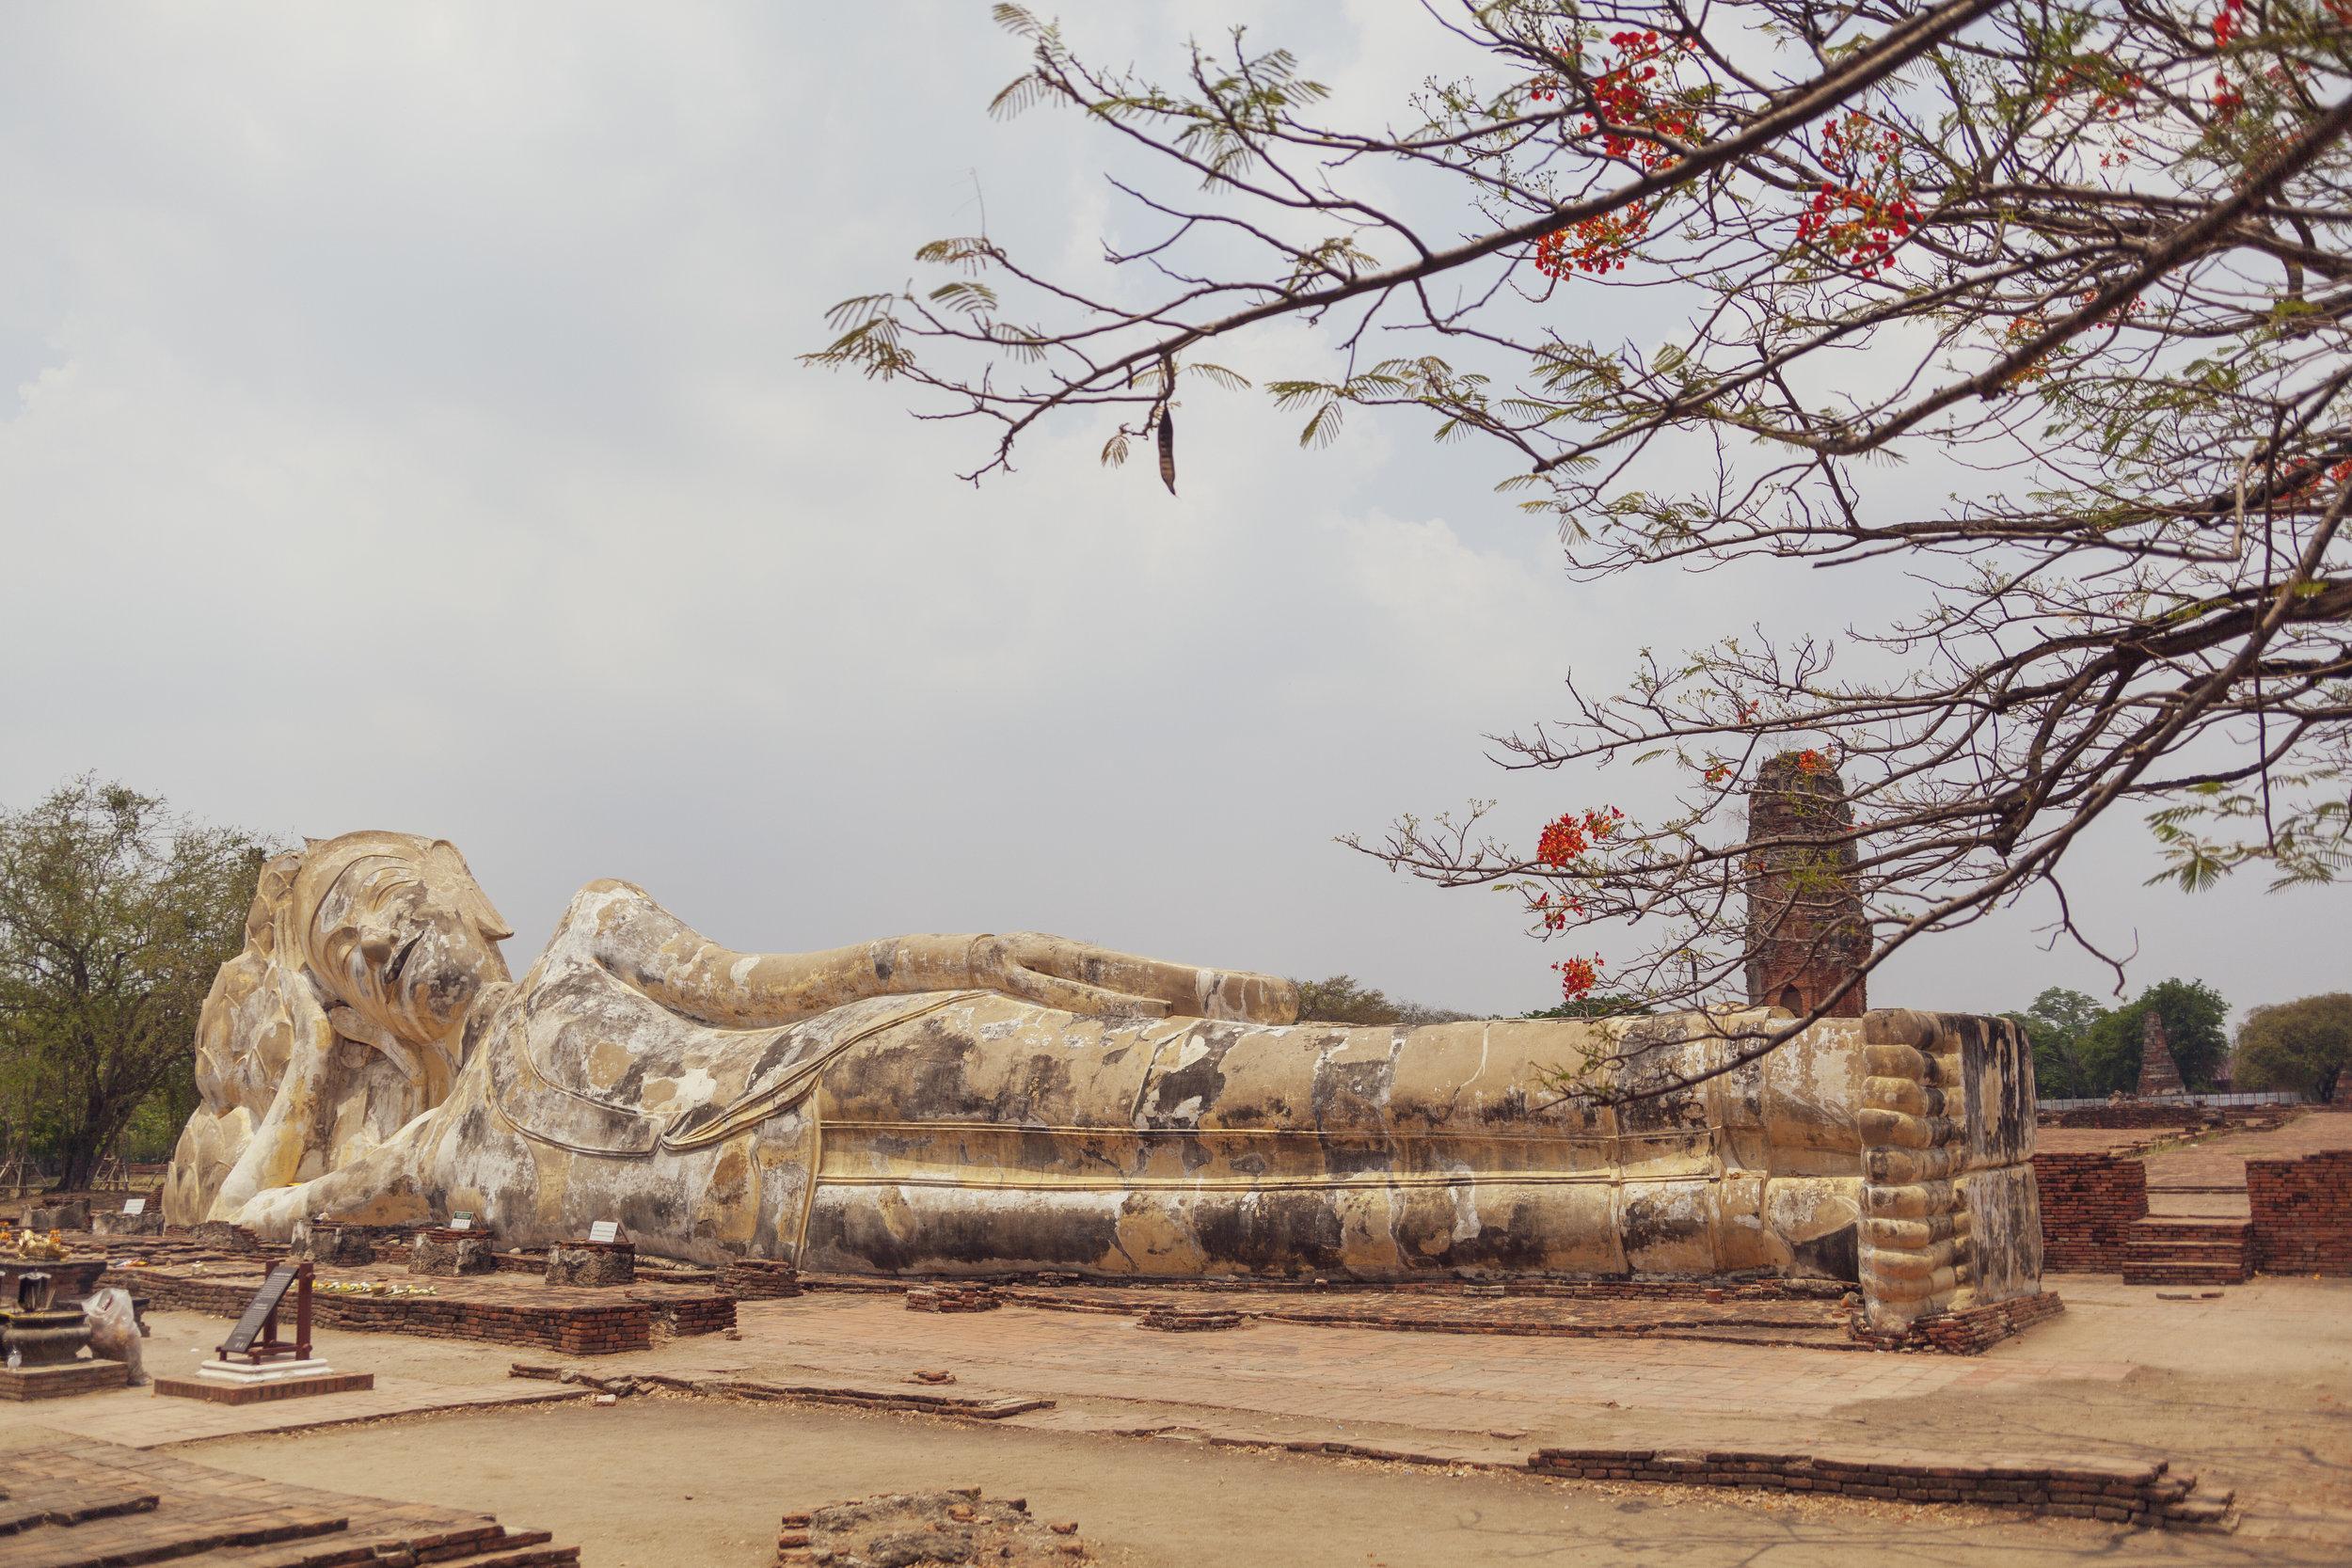 Thailand_252.jpg